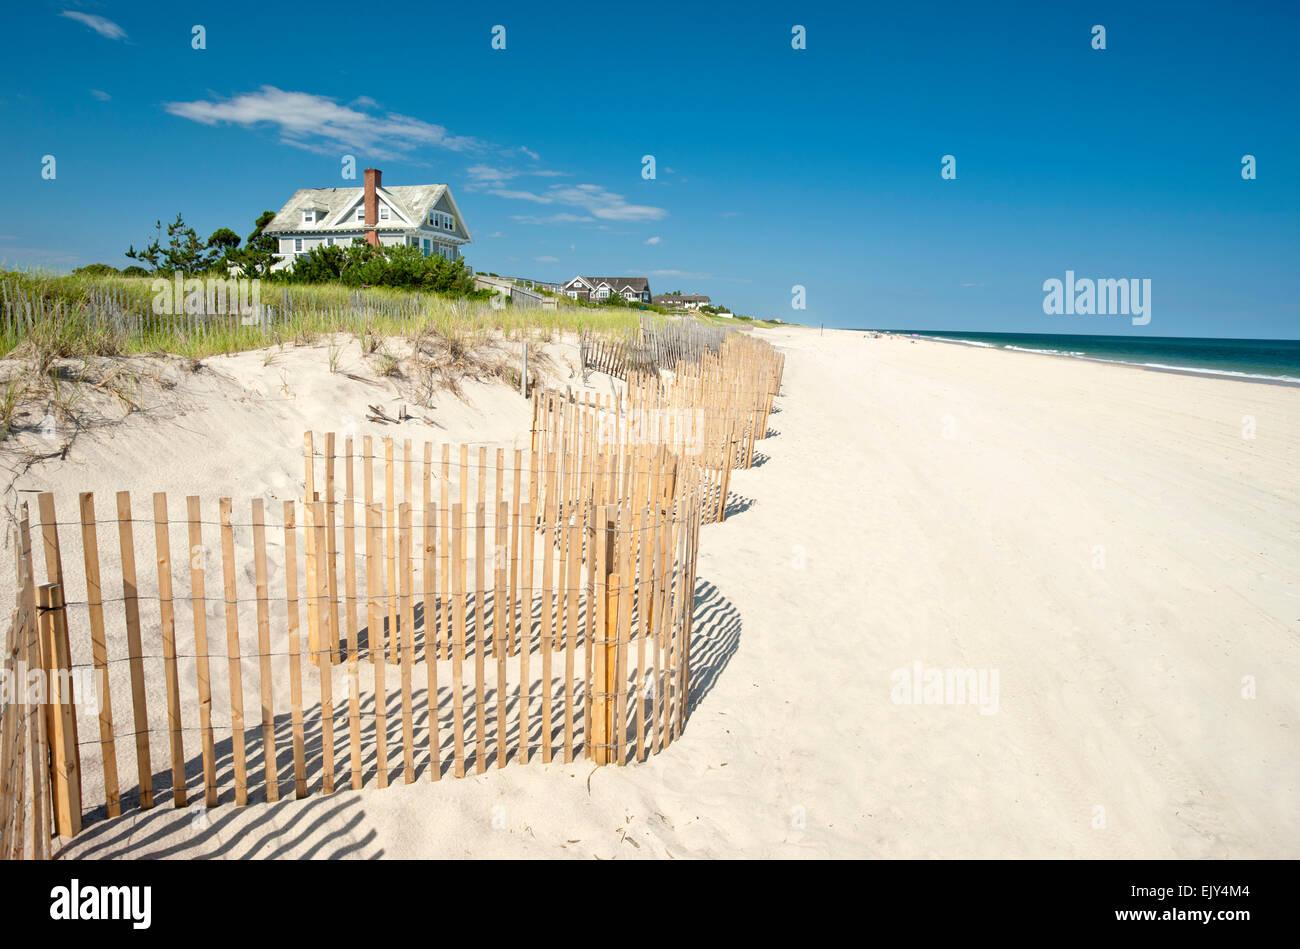 BEACH HOUSE ON DUNES ATLANTIC BEACH AMAGANSETT SUFFOLK COUNTY LONG ISLAND NEW YORK STATE USA - Stock Image